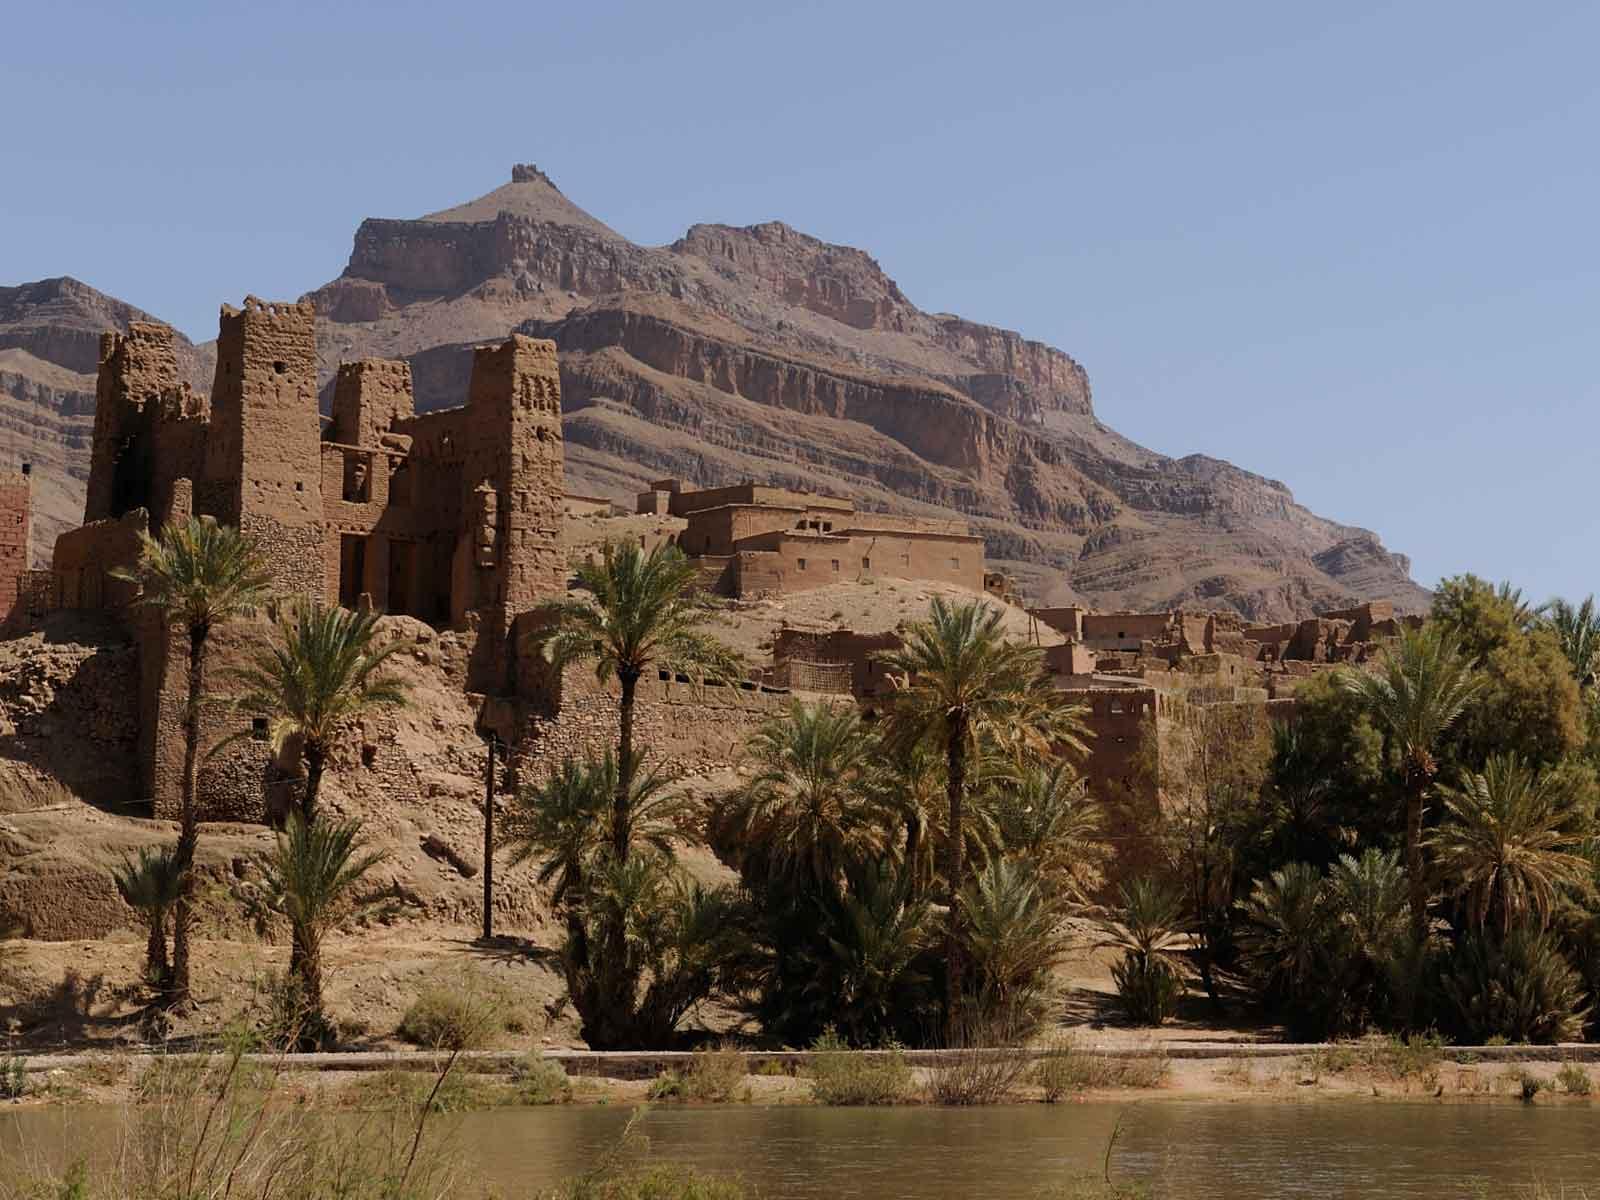 Marrakech sahara desert tour 2 days